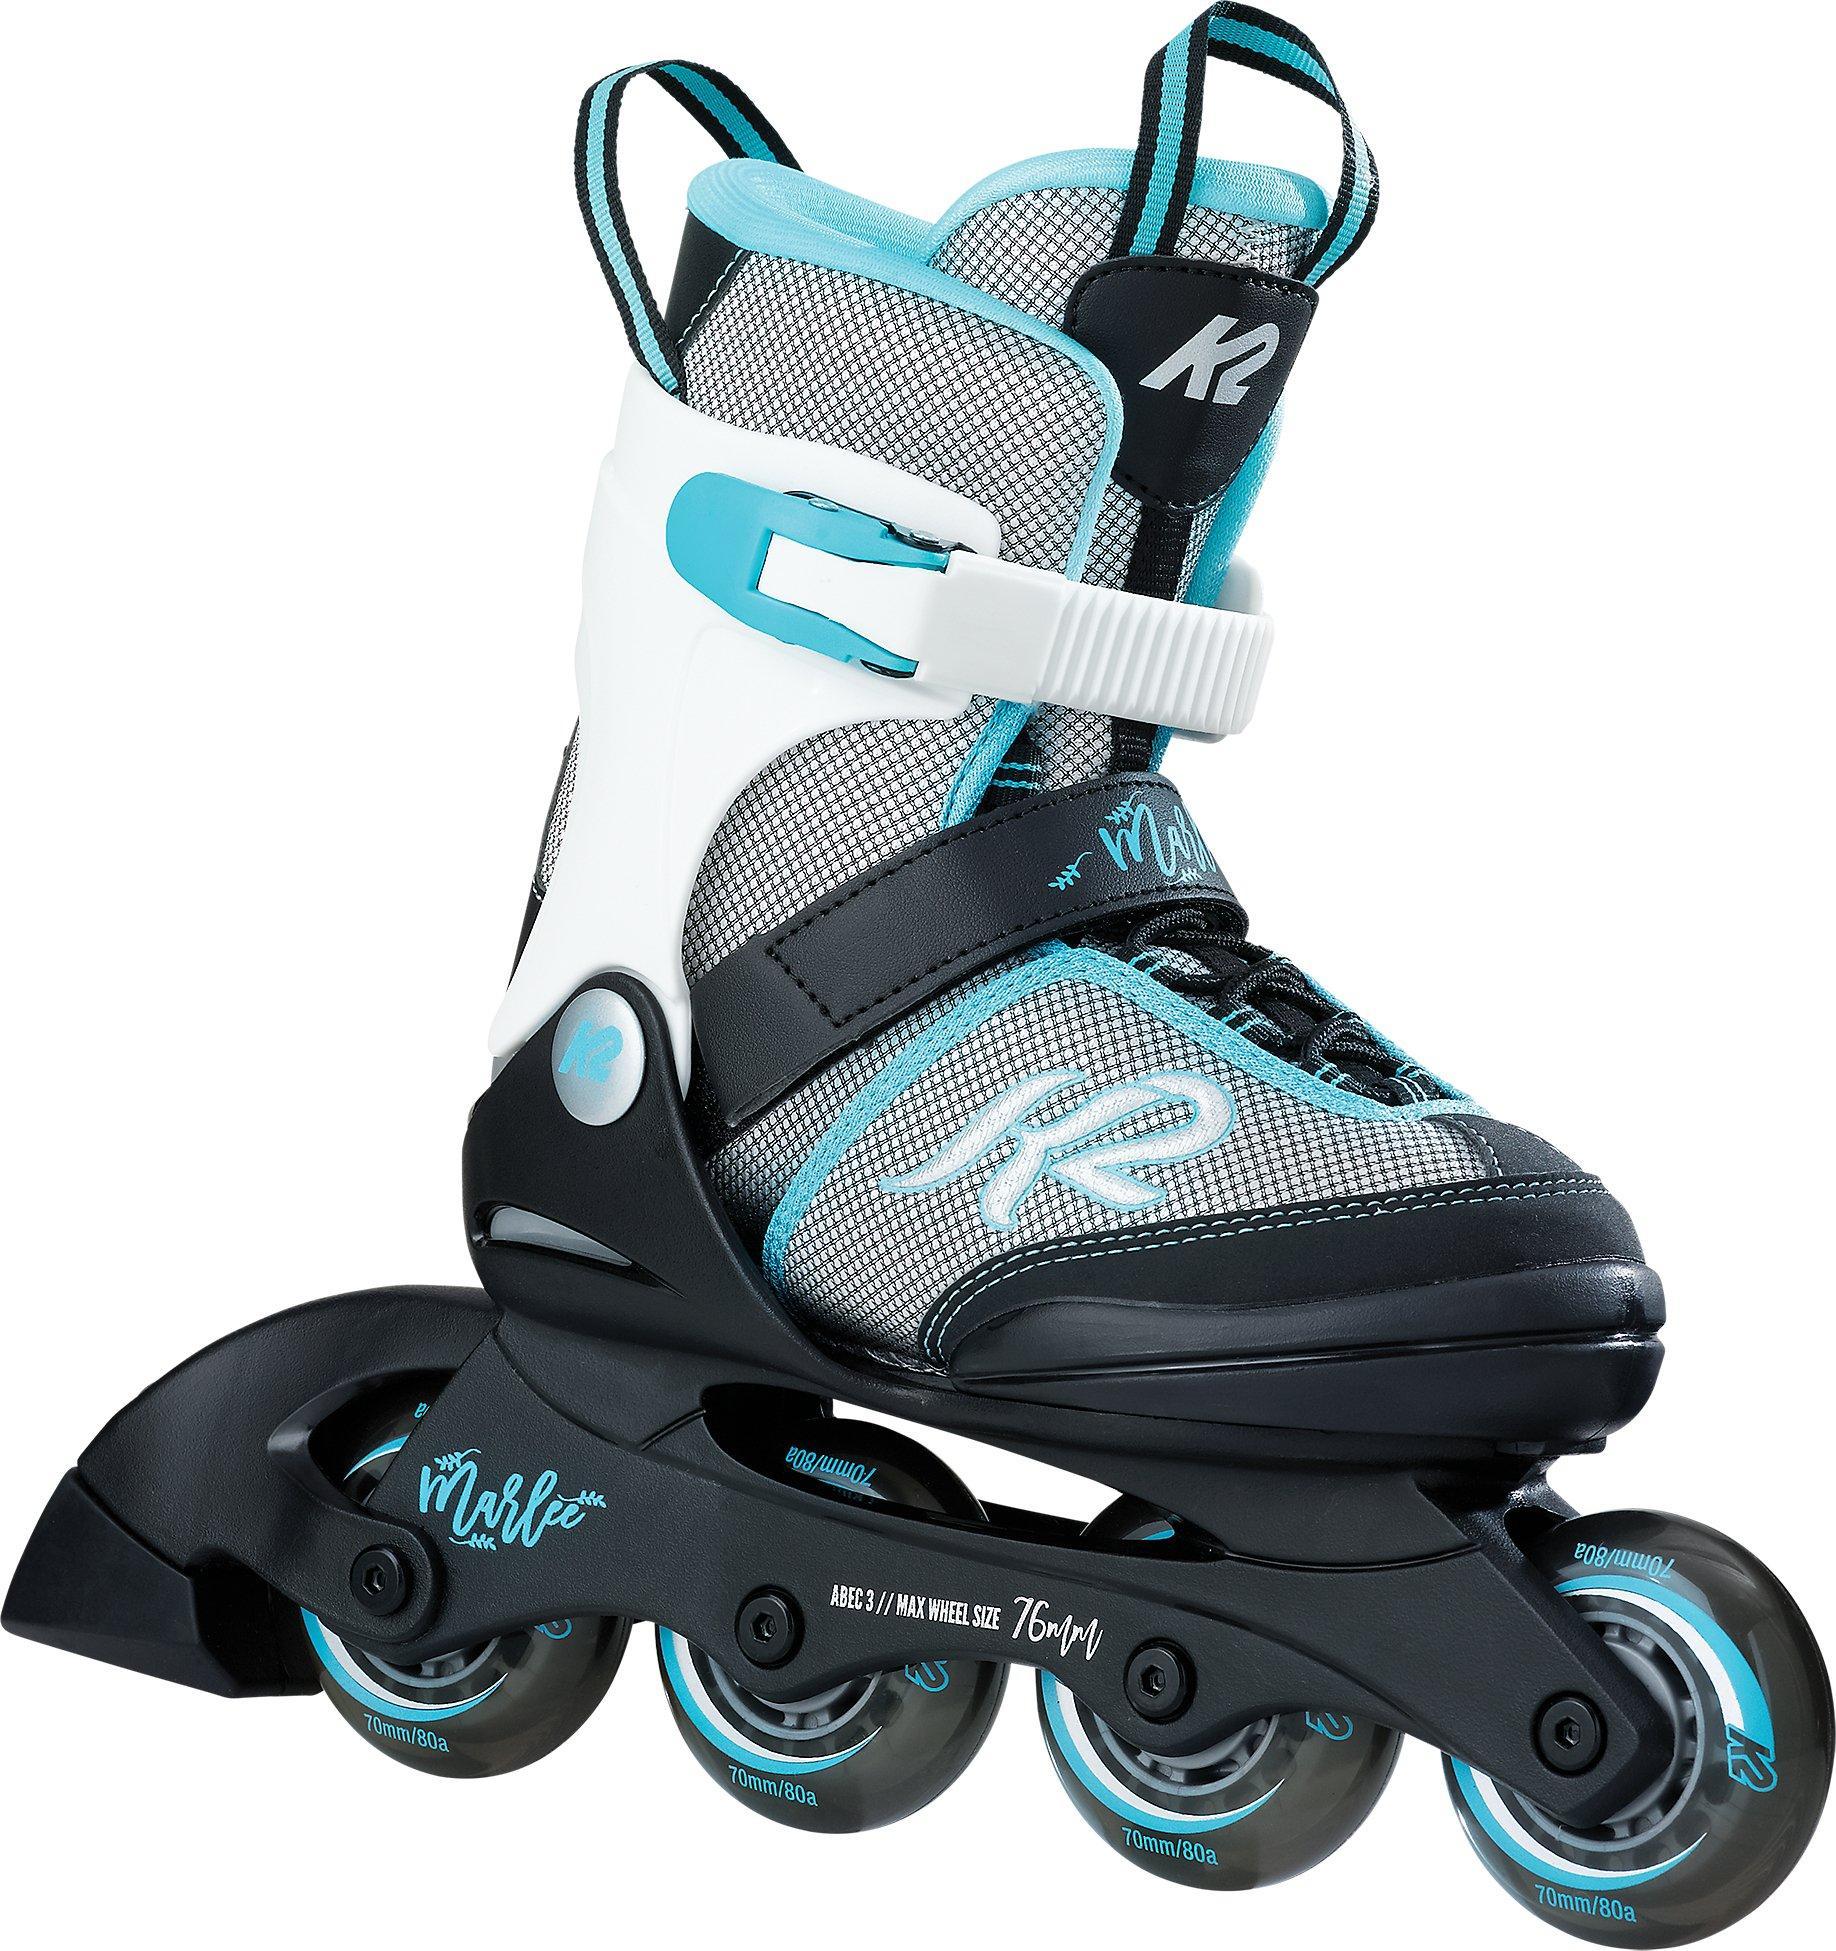 Bleu Pointure K2 Skates Marlee Ice Patins /à Glace pour Fille Camouflage